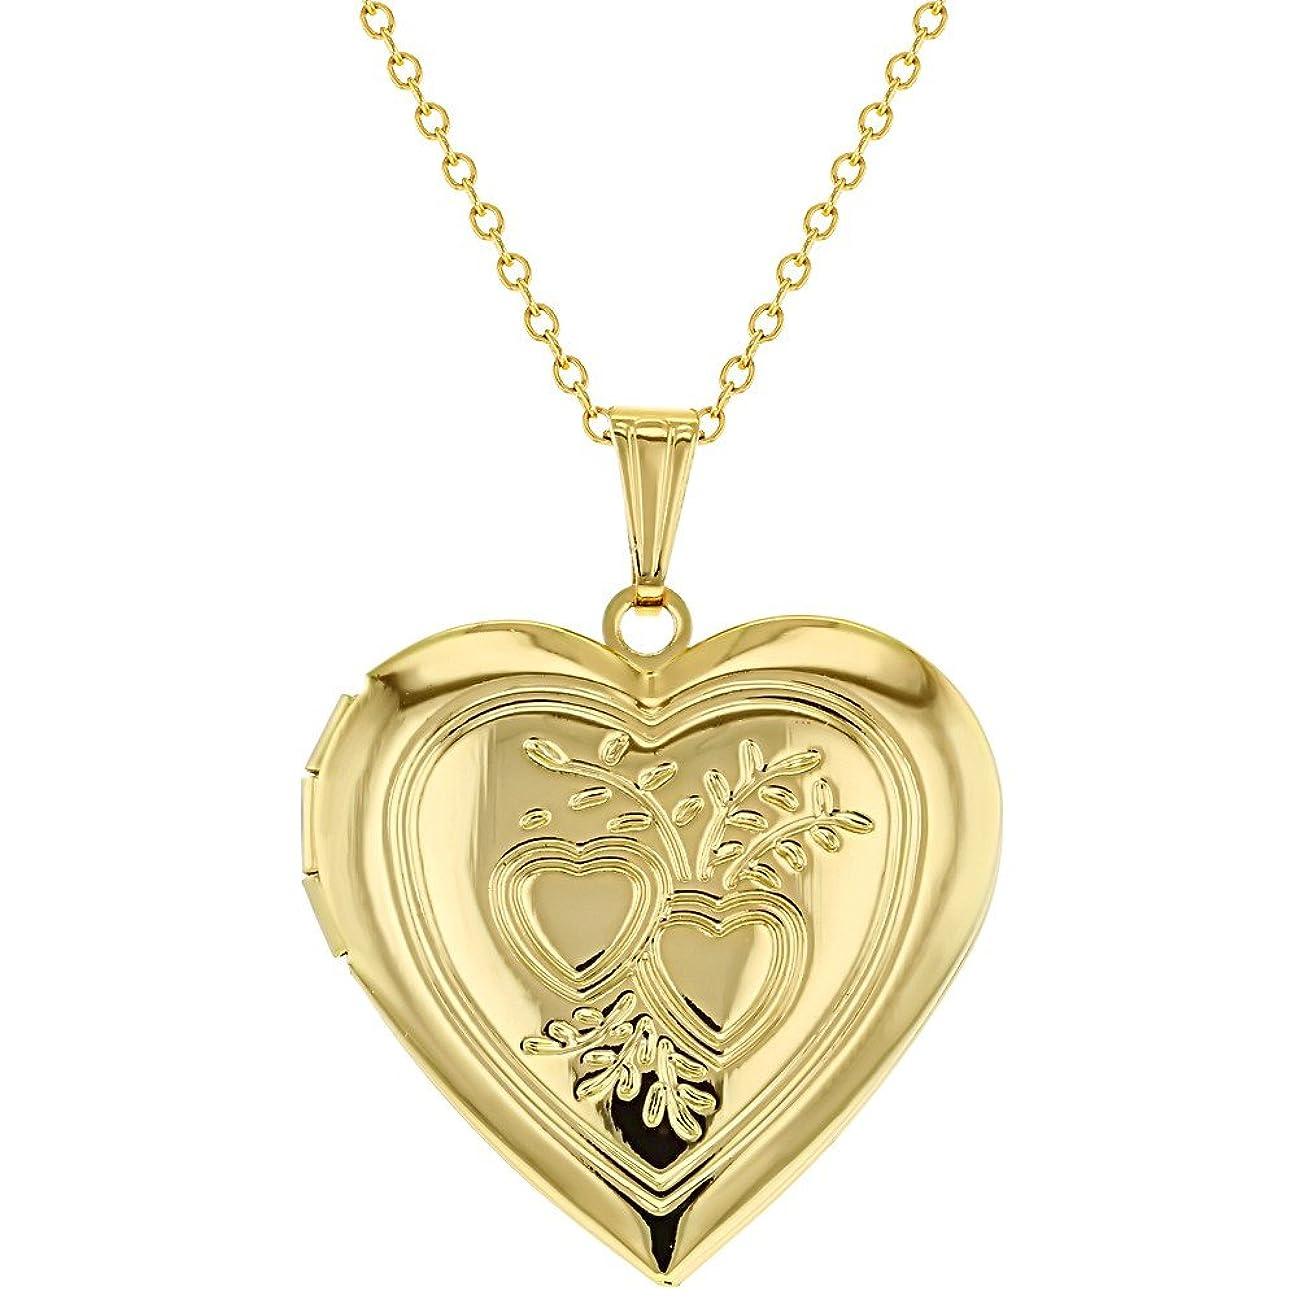 In Season Jewelry Gold Tone Heart Photo Locket Necklace Pendant Memory Love Remembrance 19